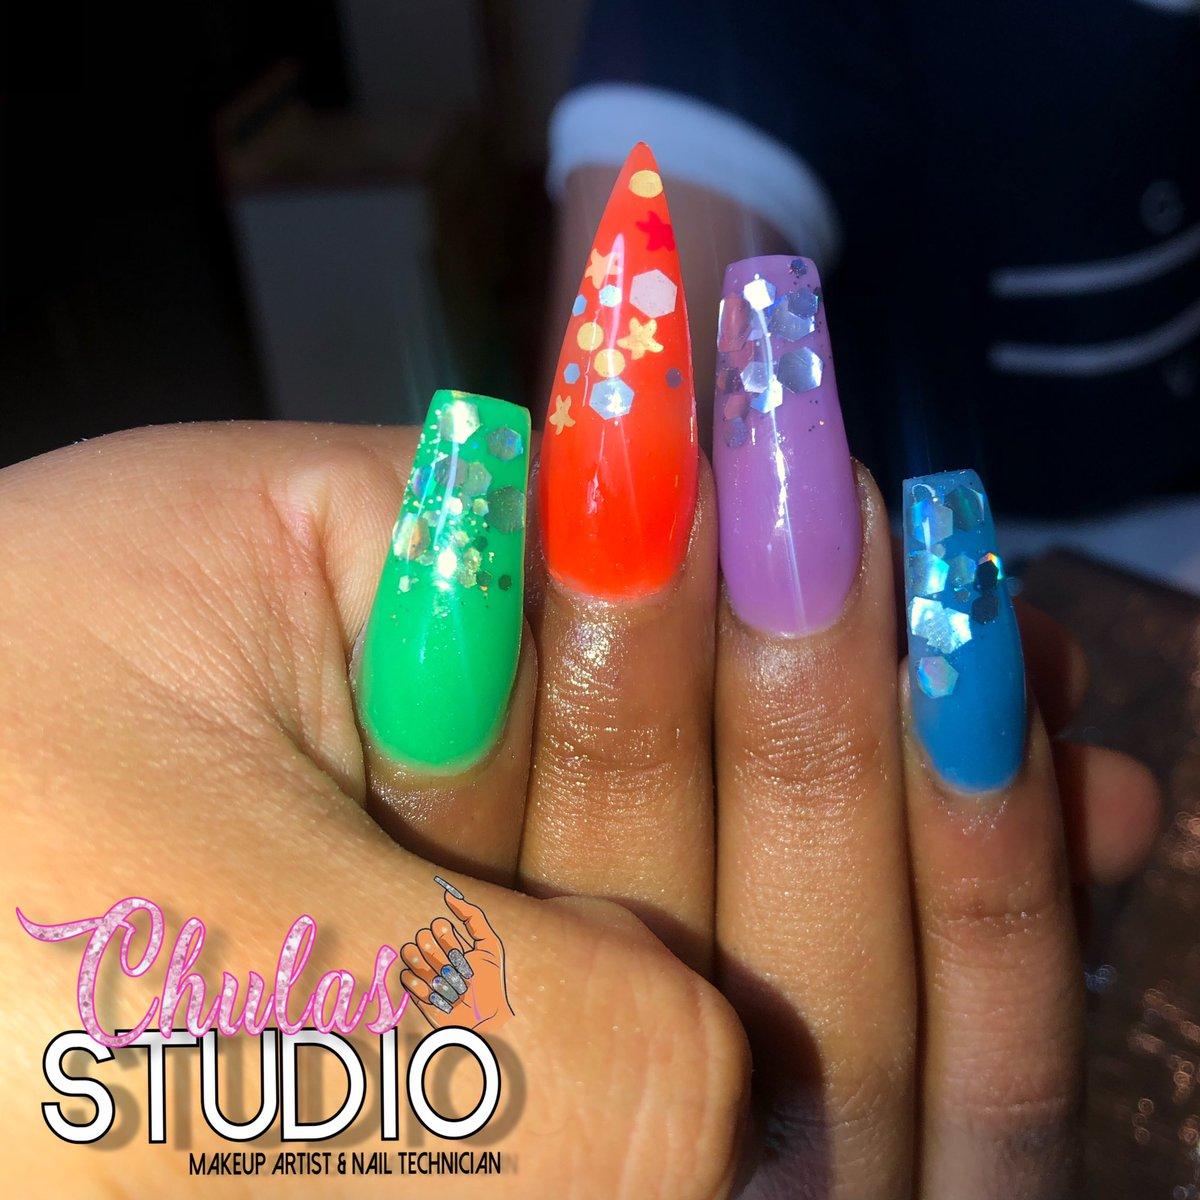 Practice set I did back in August 🥰 ✨DM for Nail Appointments  instagram: @chulasstudio🌸 . . . . . #winstonsalemmua #336makeup #makeuplooks #winstonsalemnailtech #chulasstudio #beatxjocy #winstonnails #ncnails #instagramnails #gboronails #highpointnails https://t.co/uioQ7ZTWOf